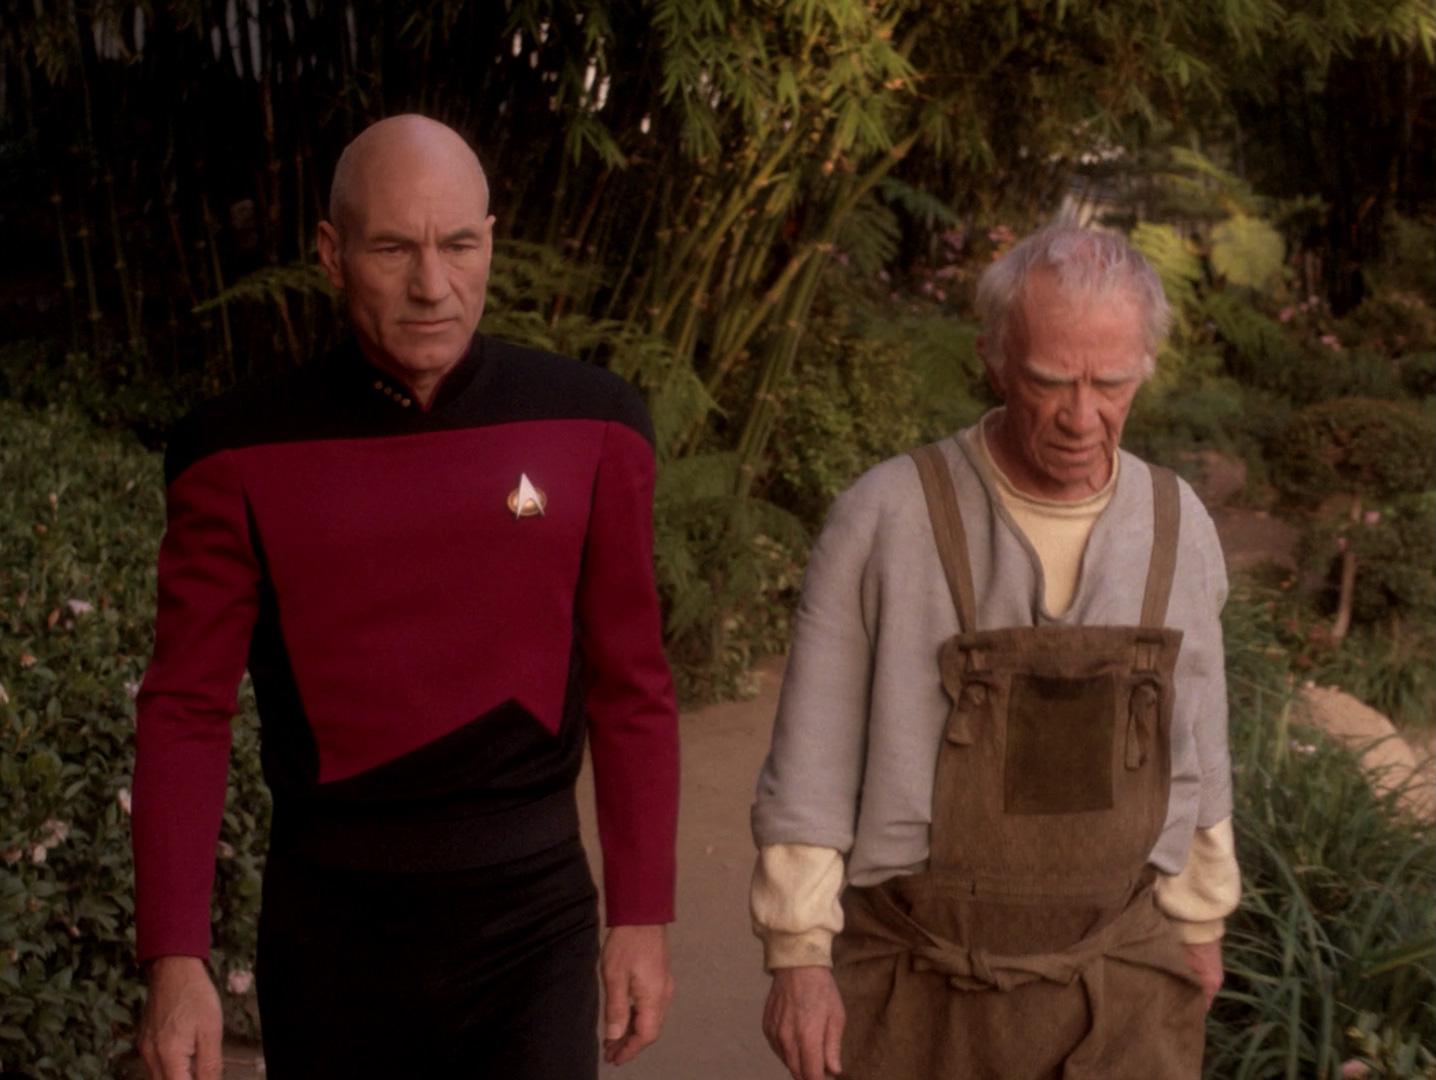 Boothby und Picard.jpg